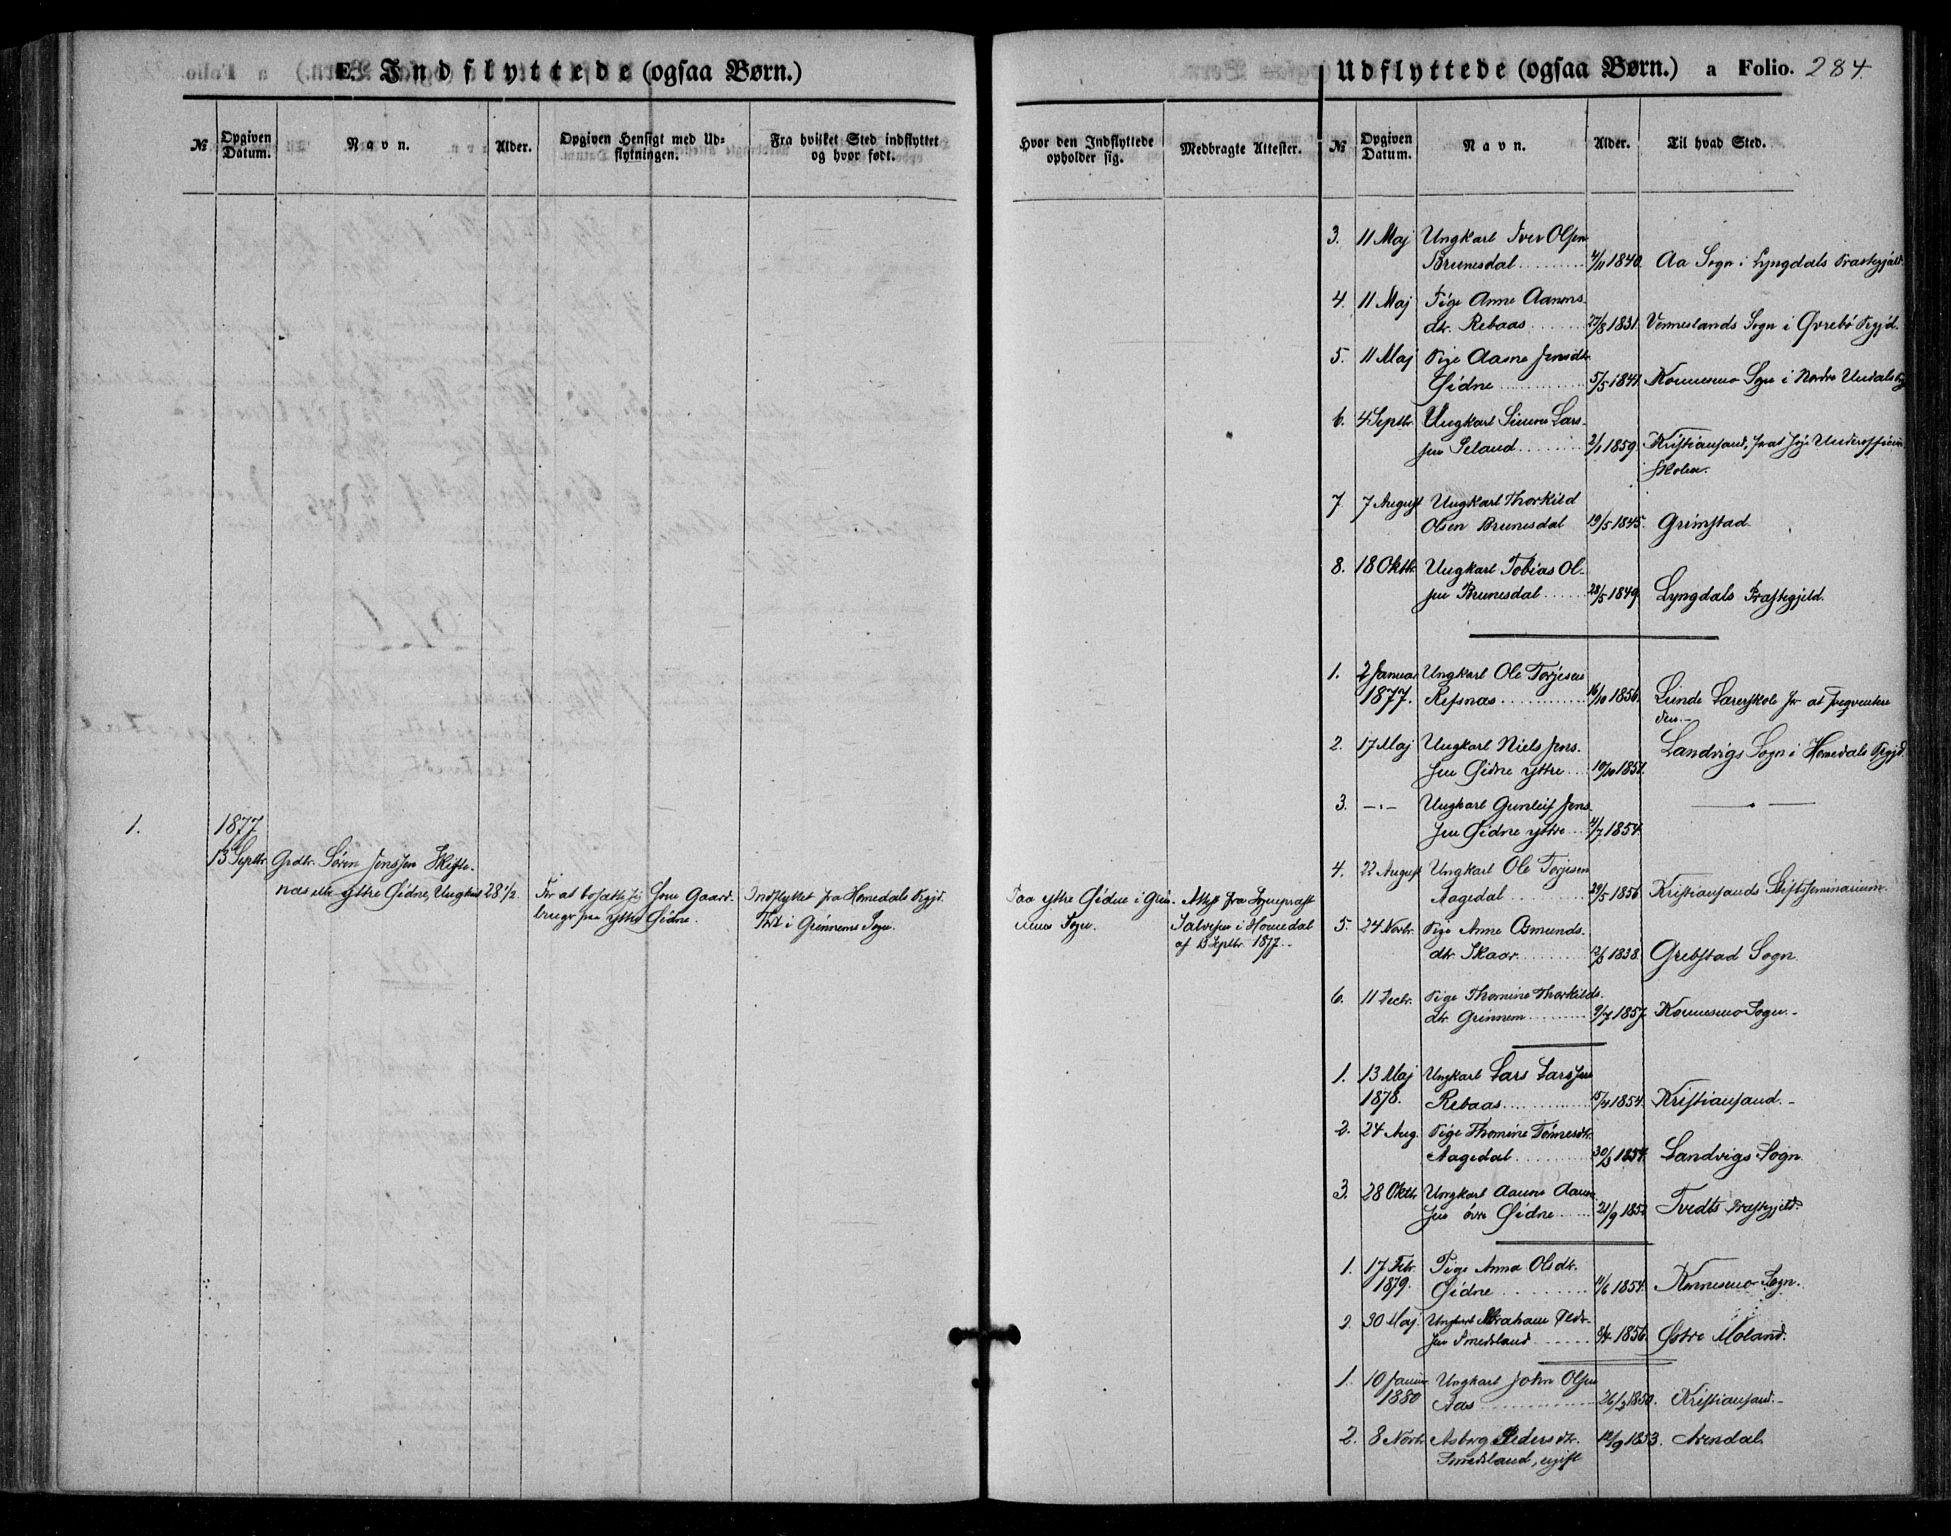 SAK, Bjelland sokneprestkontor, F/Fa/Fac/L0002: Ministerialbok nr. A 2, 1866-1887, s. 284